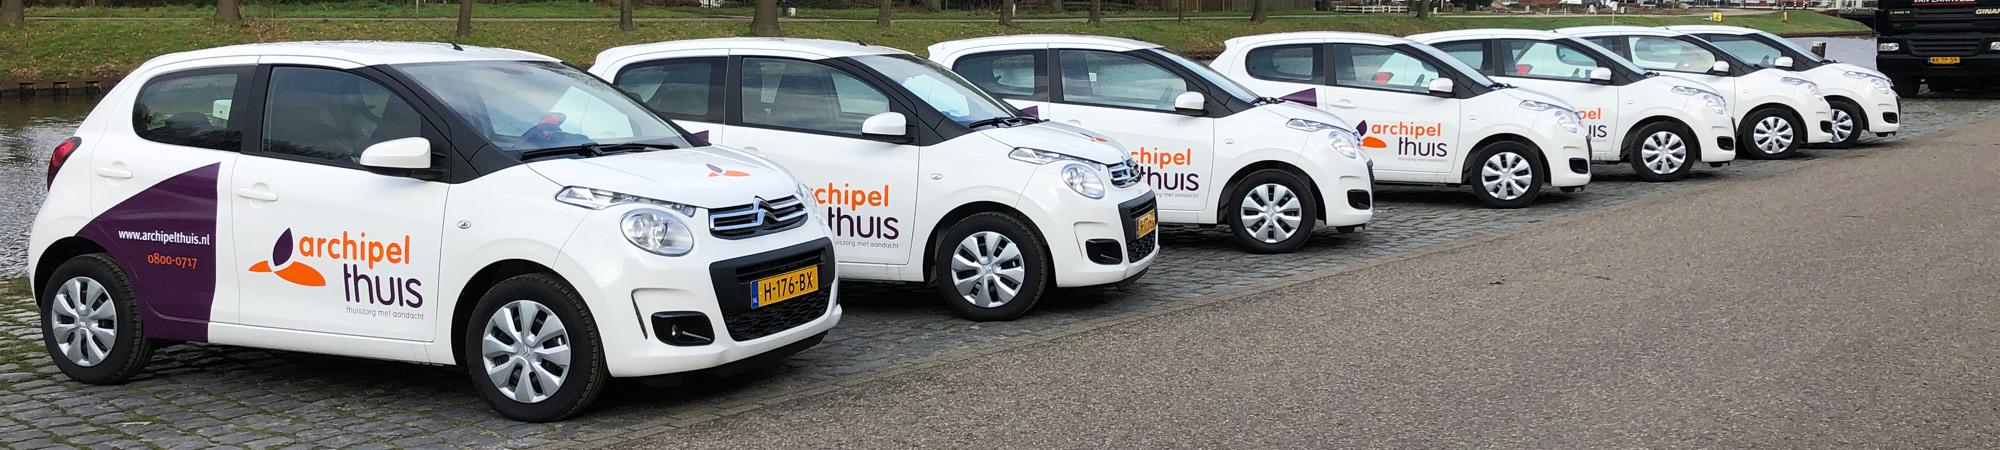 Belettering personenauto's Archipel Thuis